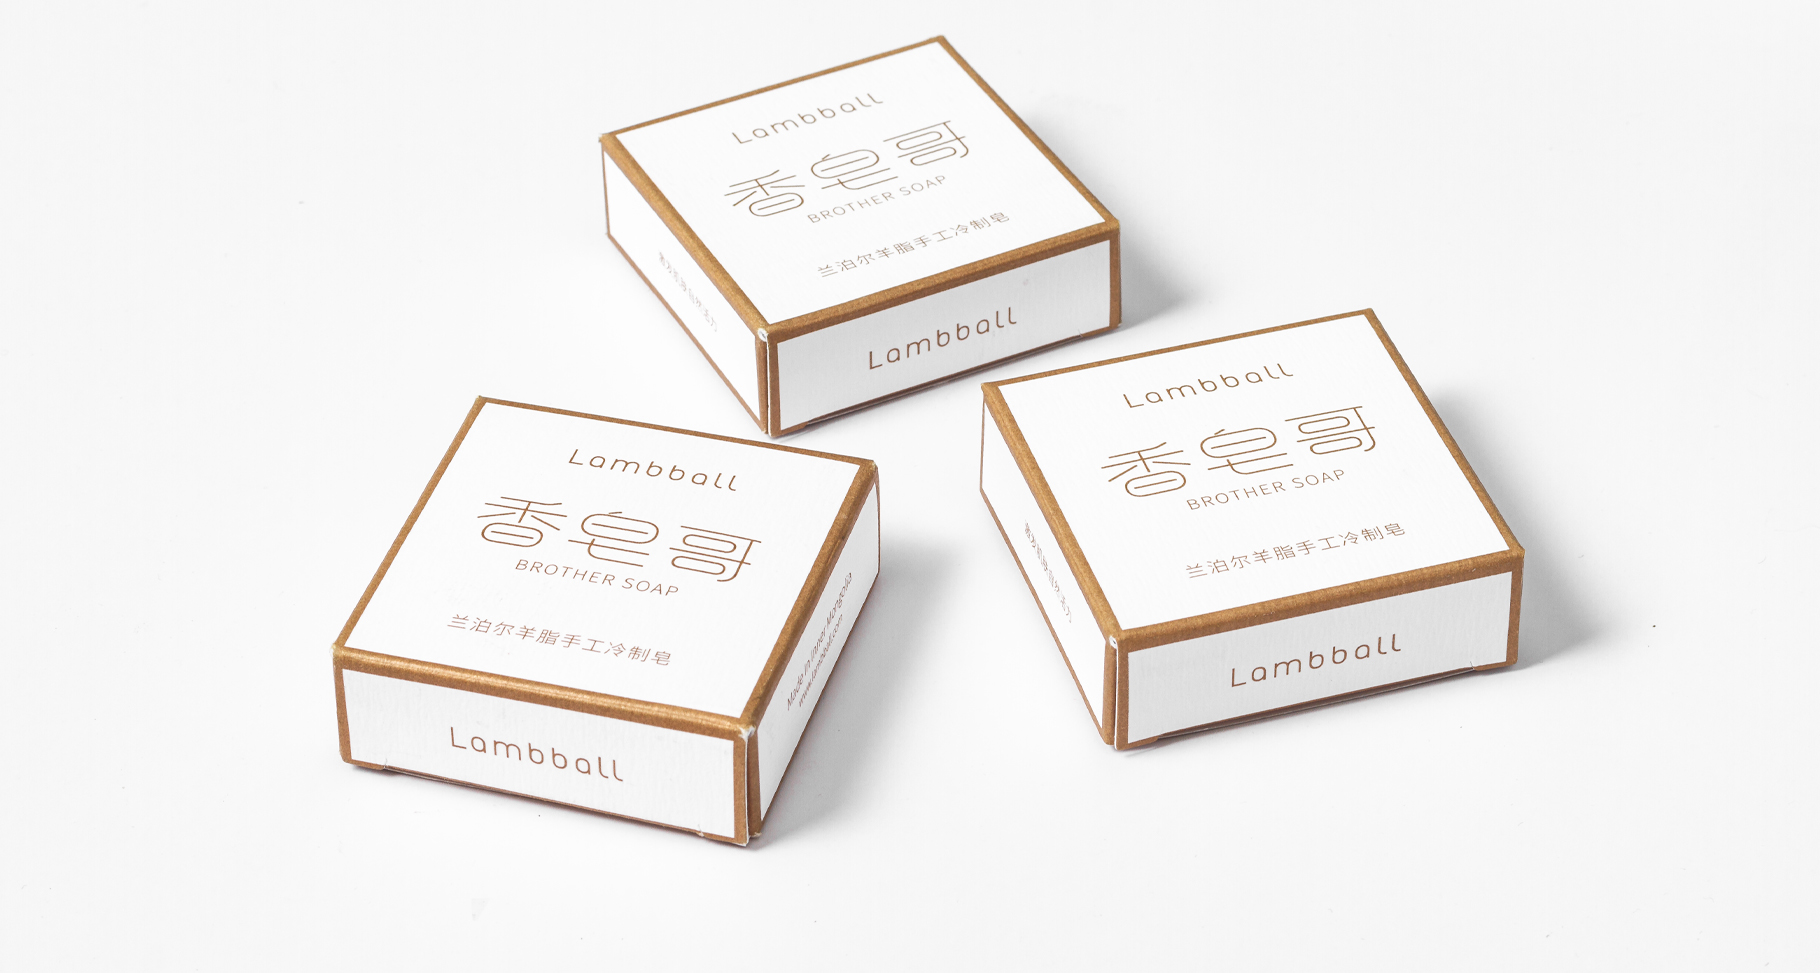 lambball品牌系列产品包装设计 第7张